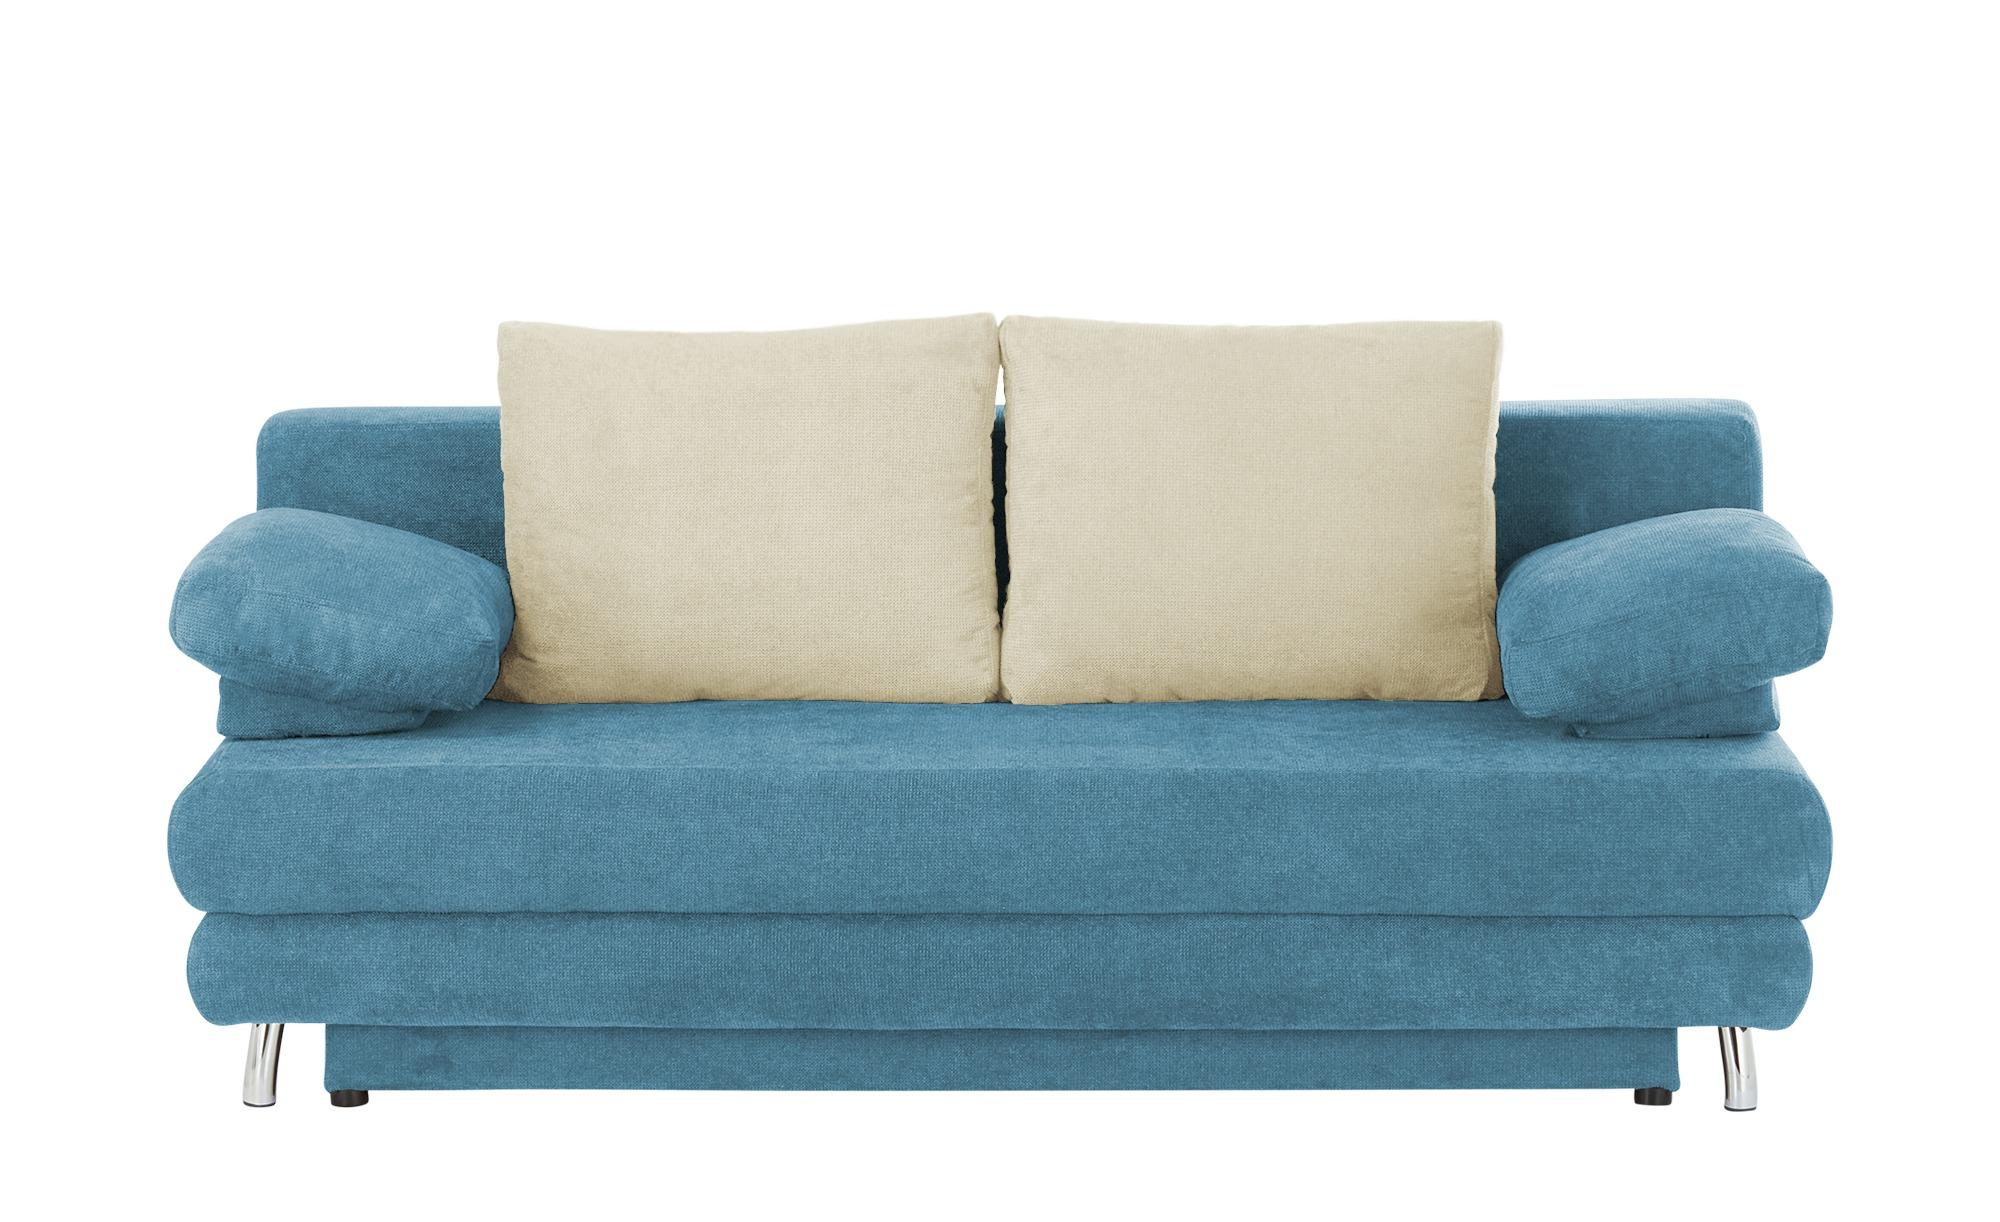 Schlafsofa  Calina ¦ blau ¦ Maße (cm): B: 205 H: 80 T: 100 Polstermöbel > Sofas > 2-Sitzer - Höffner